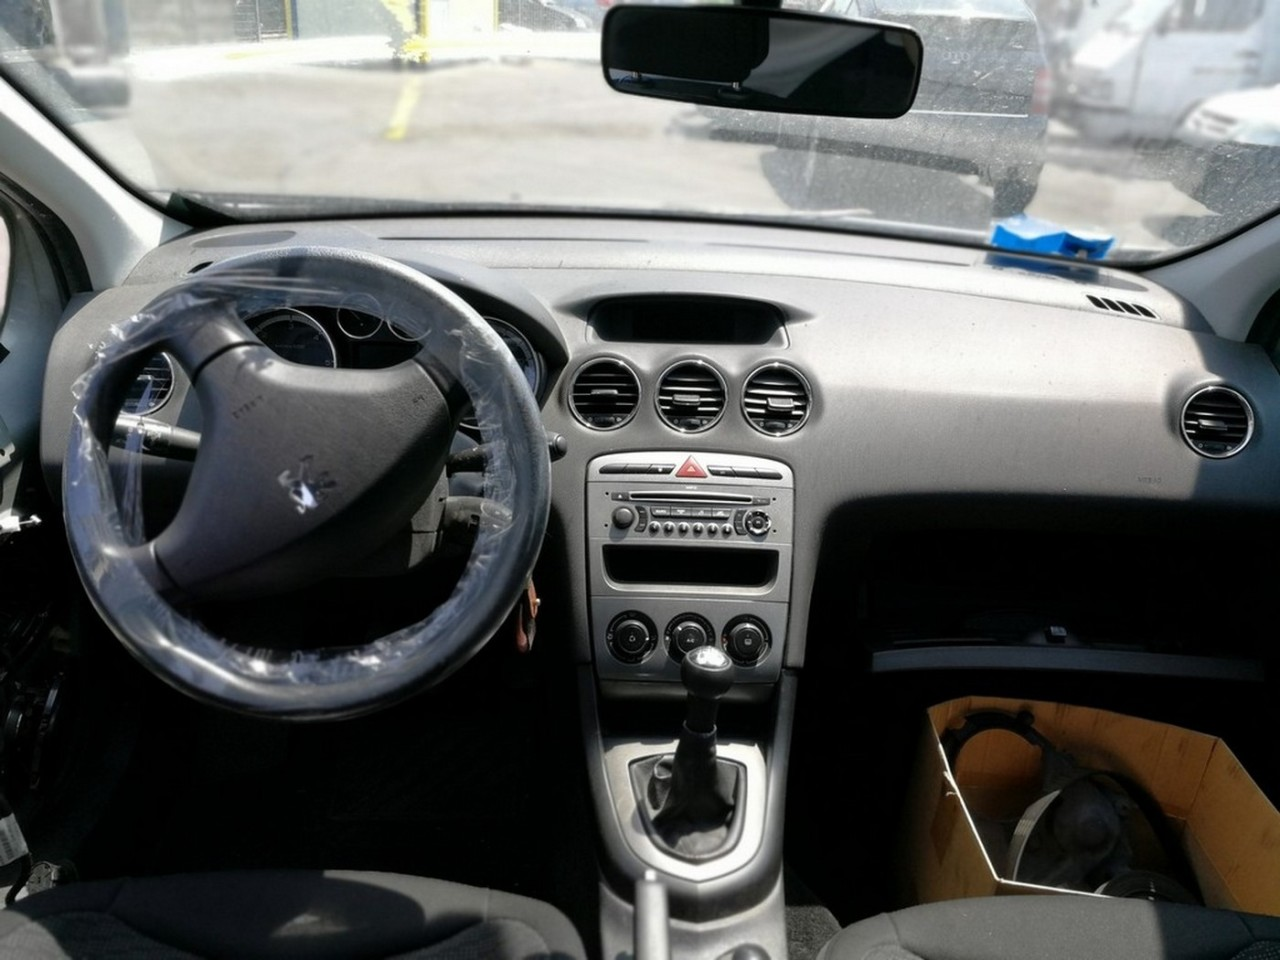 DEZMEMBRARI AUTO / DEZMEMBREZ Peugeot 308 sw an de fabricatie 2007 - 2008 - 2009 - 2010 - 2011